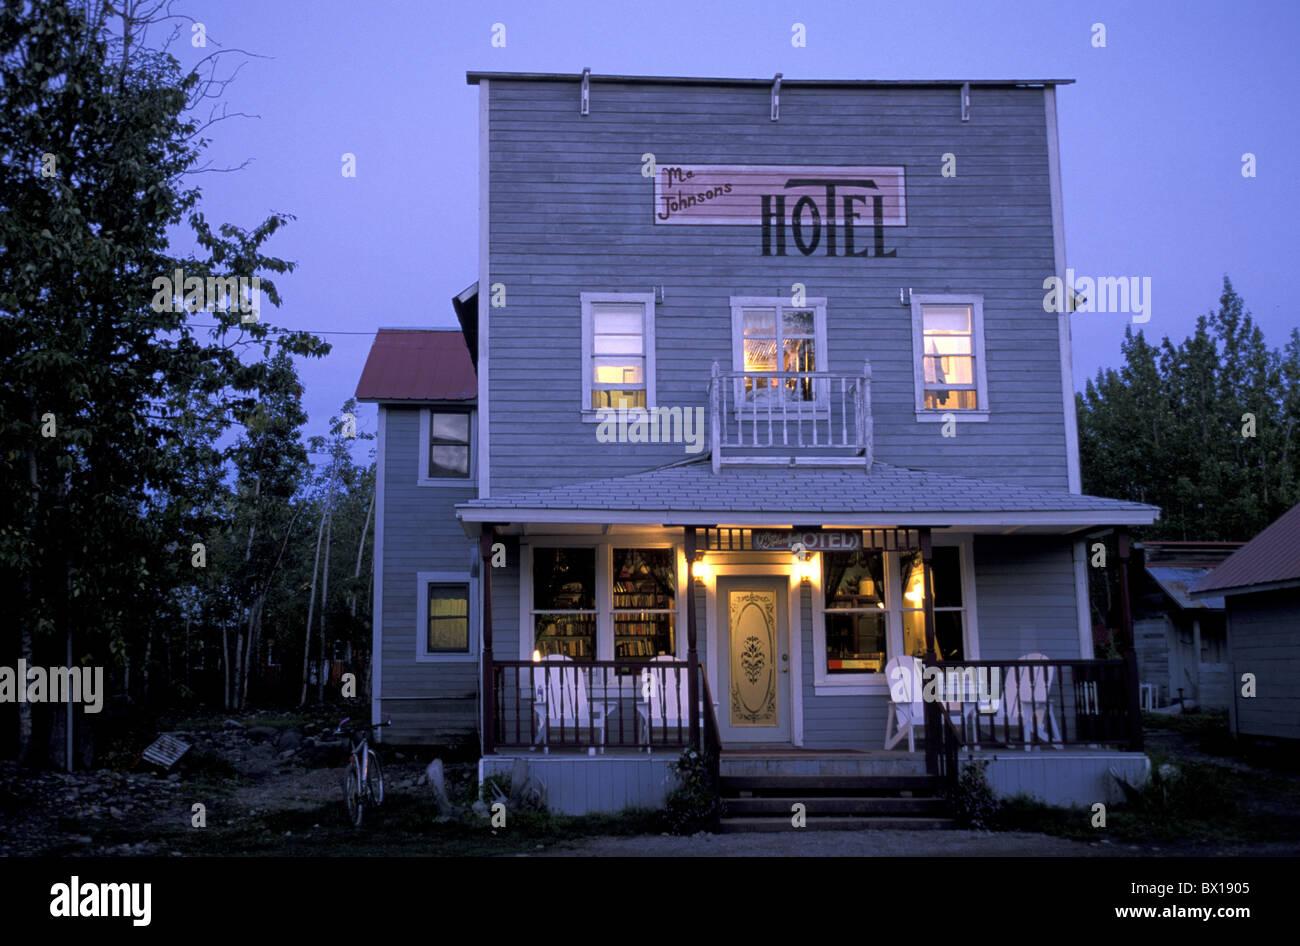 Alaska Ma Johnsons Hotel McCarthy USA America United States tourism twilight facade wood wooden facade ho - Stock Image